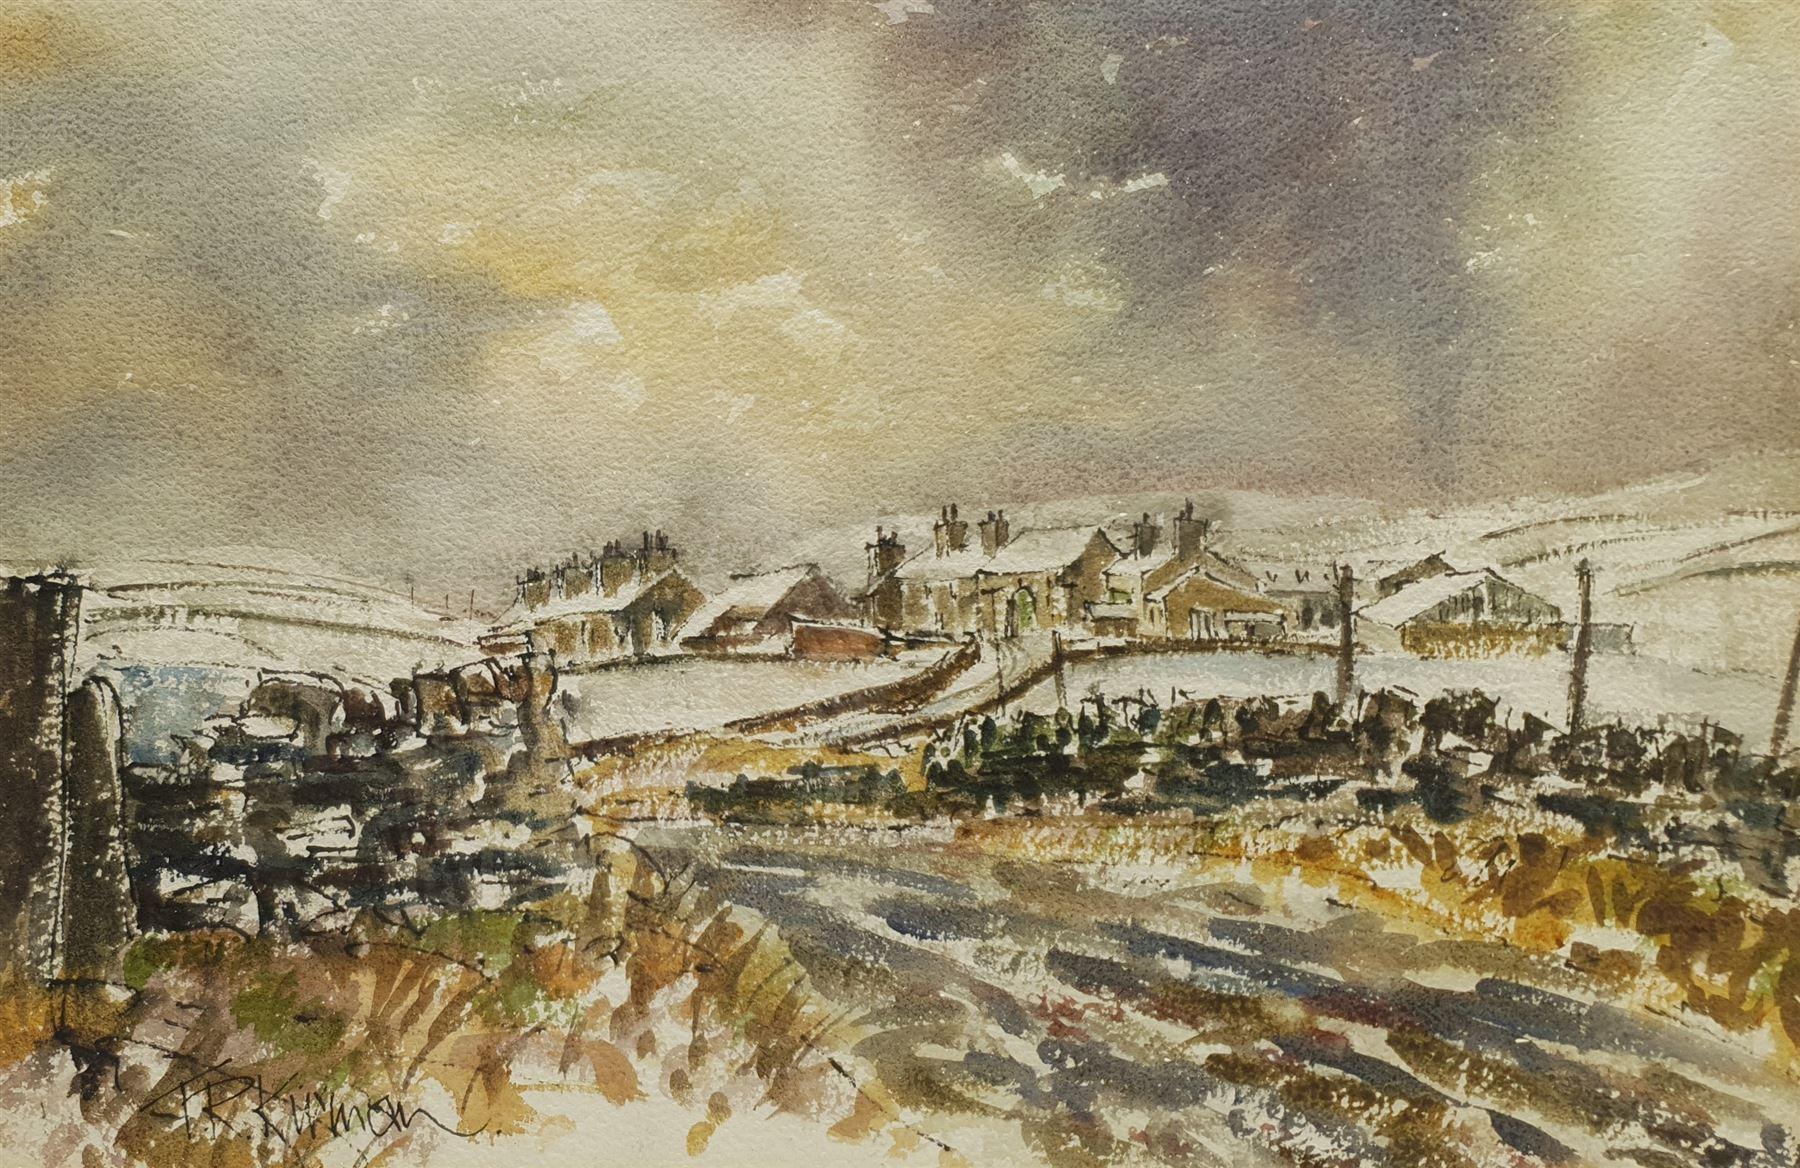 Terry Kirman (British 1939-1997): Yorkshire Dales Village in Winter